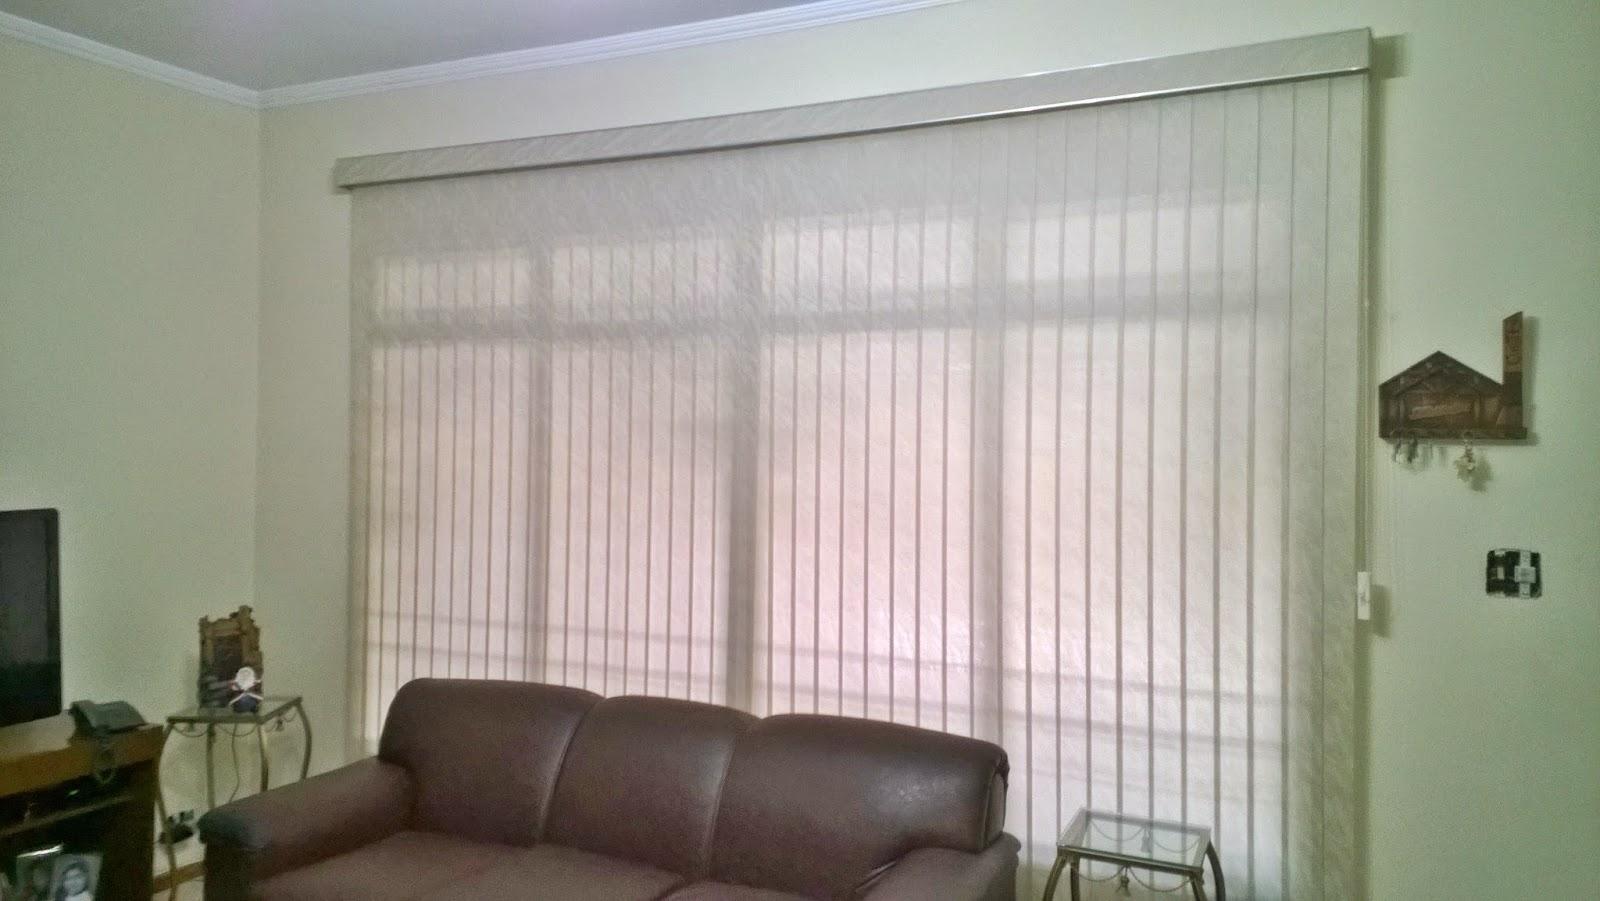 Persiana Vertical Translucida com Sanefa